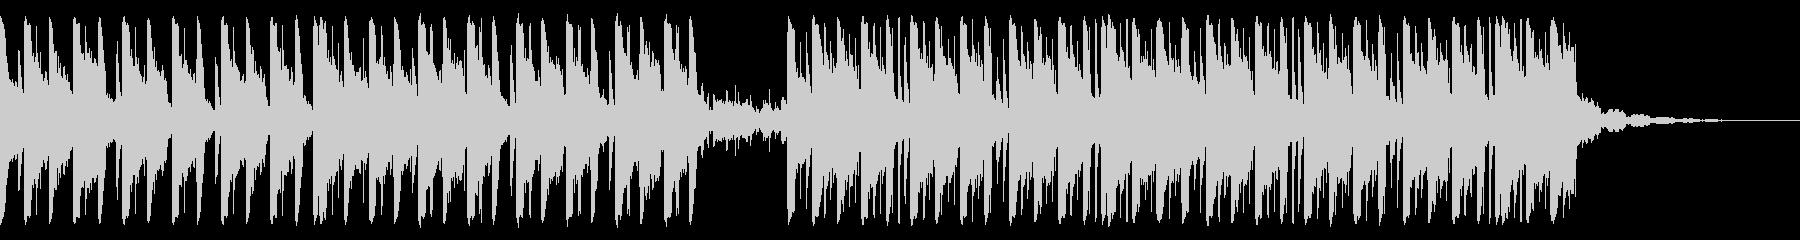 129 BPMの未再生の波形